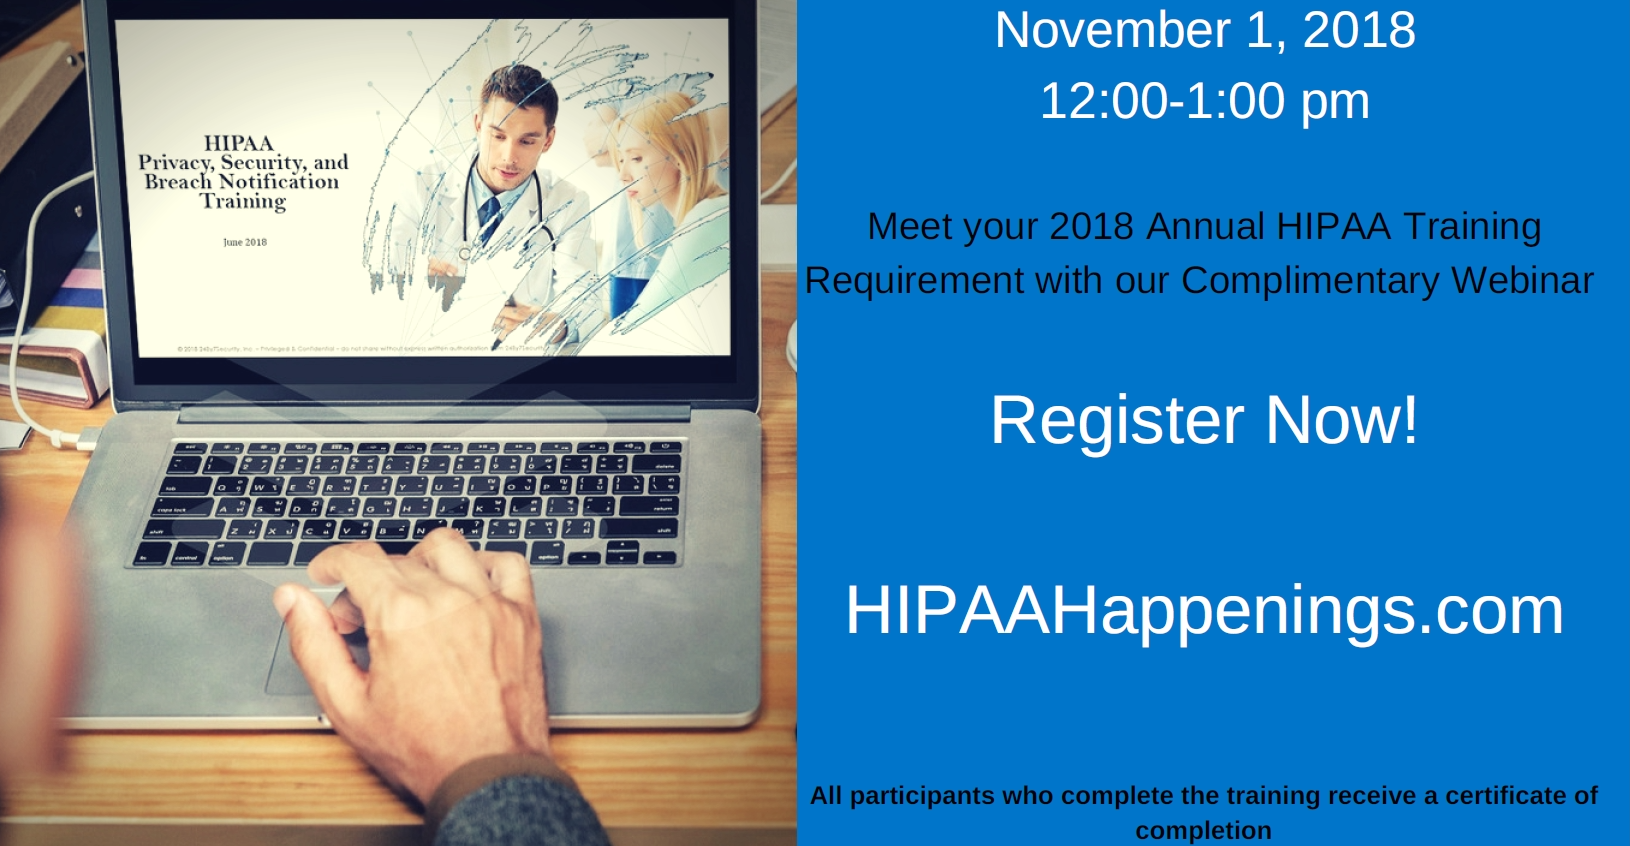 HIPAA training HIPAAHappenings